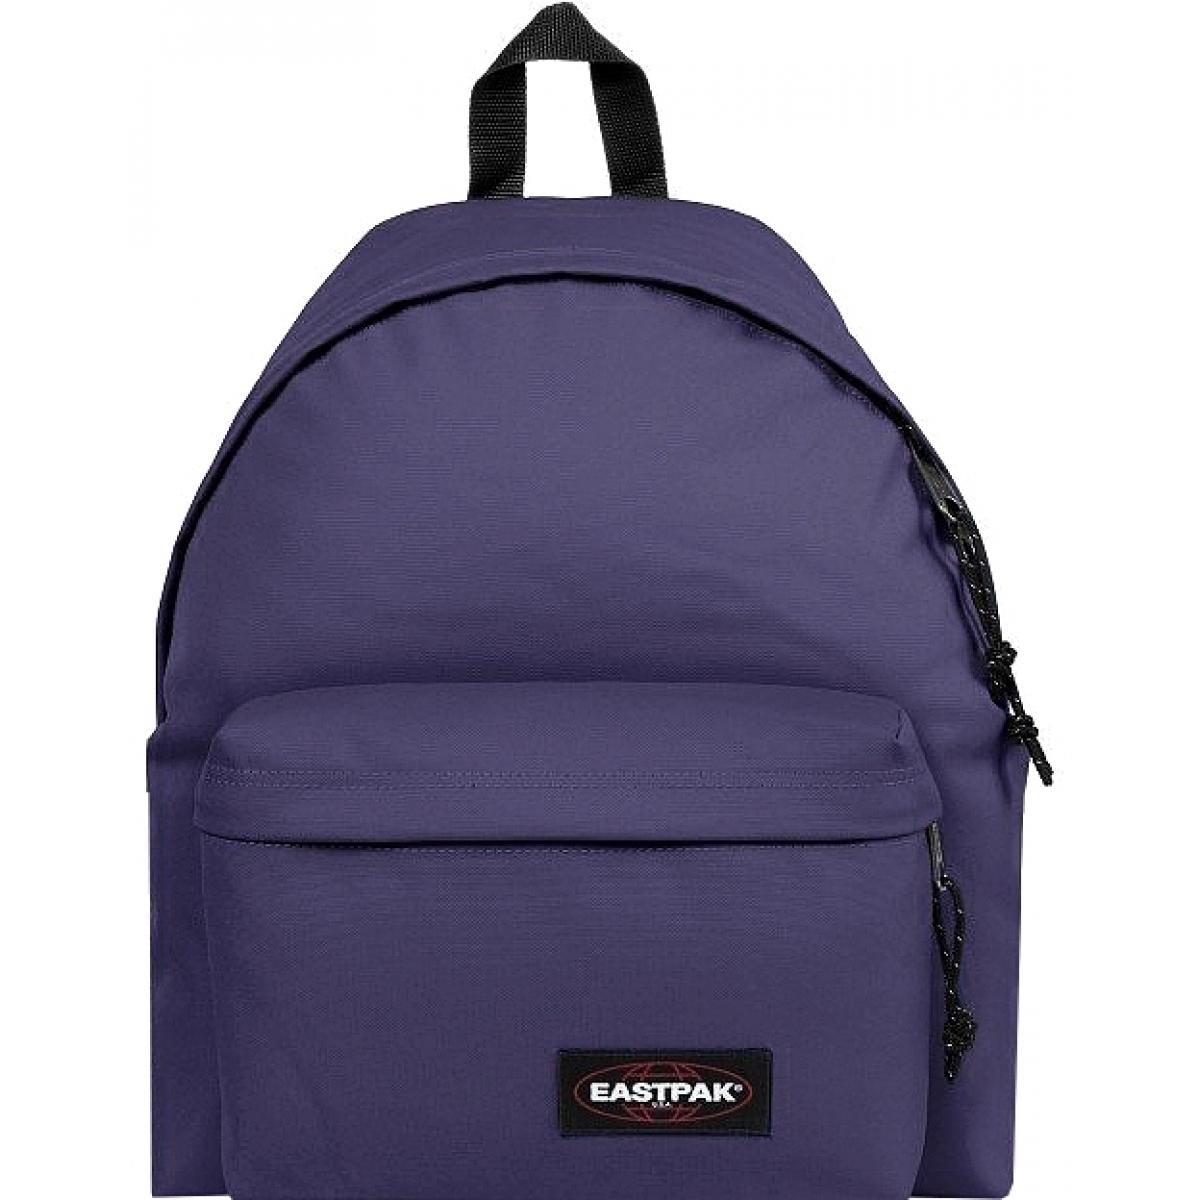 sac dos scolaire eastpak ek620 vital purple ek62062s couleur principale assortis. Black Bedroom Furniture Sets. Home Design Ideas